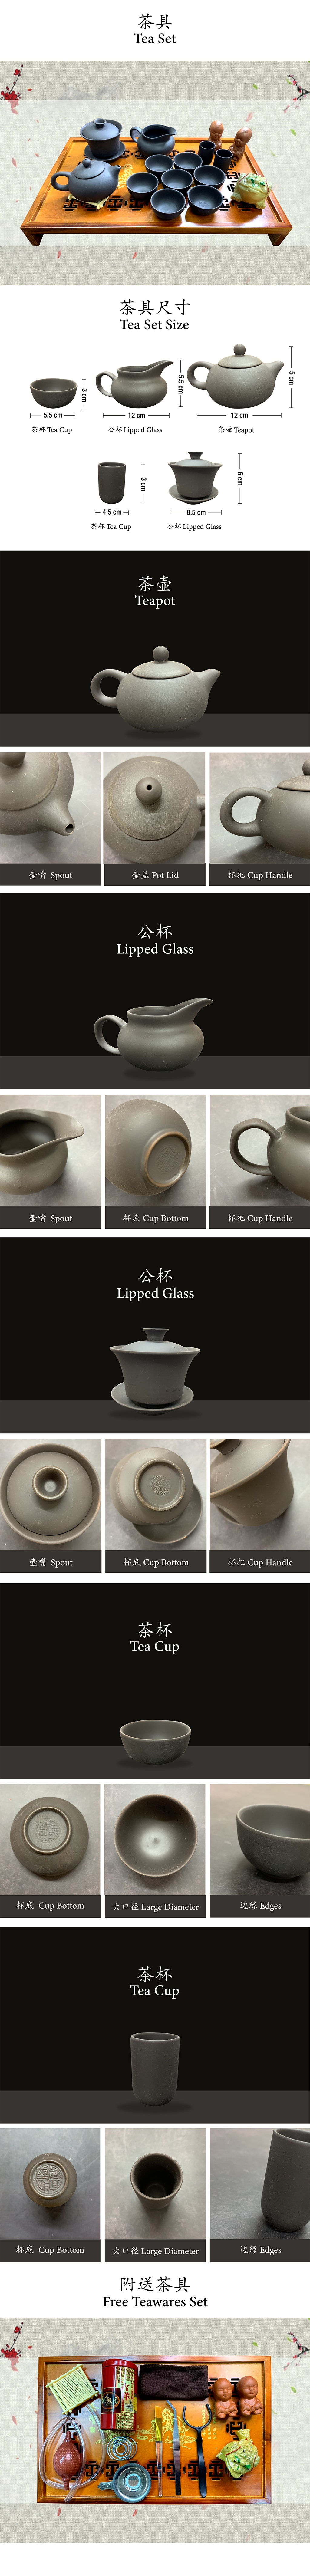 Chinese Jing Ping Tea Set - Description